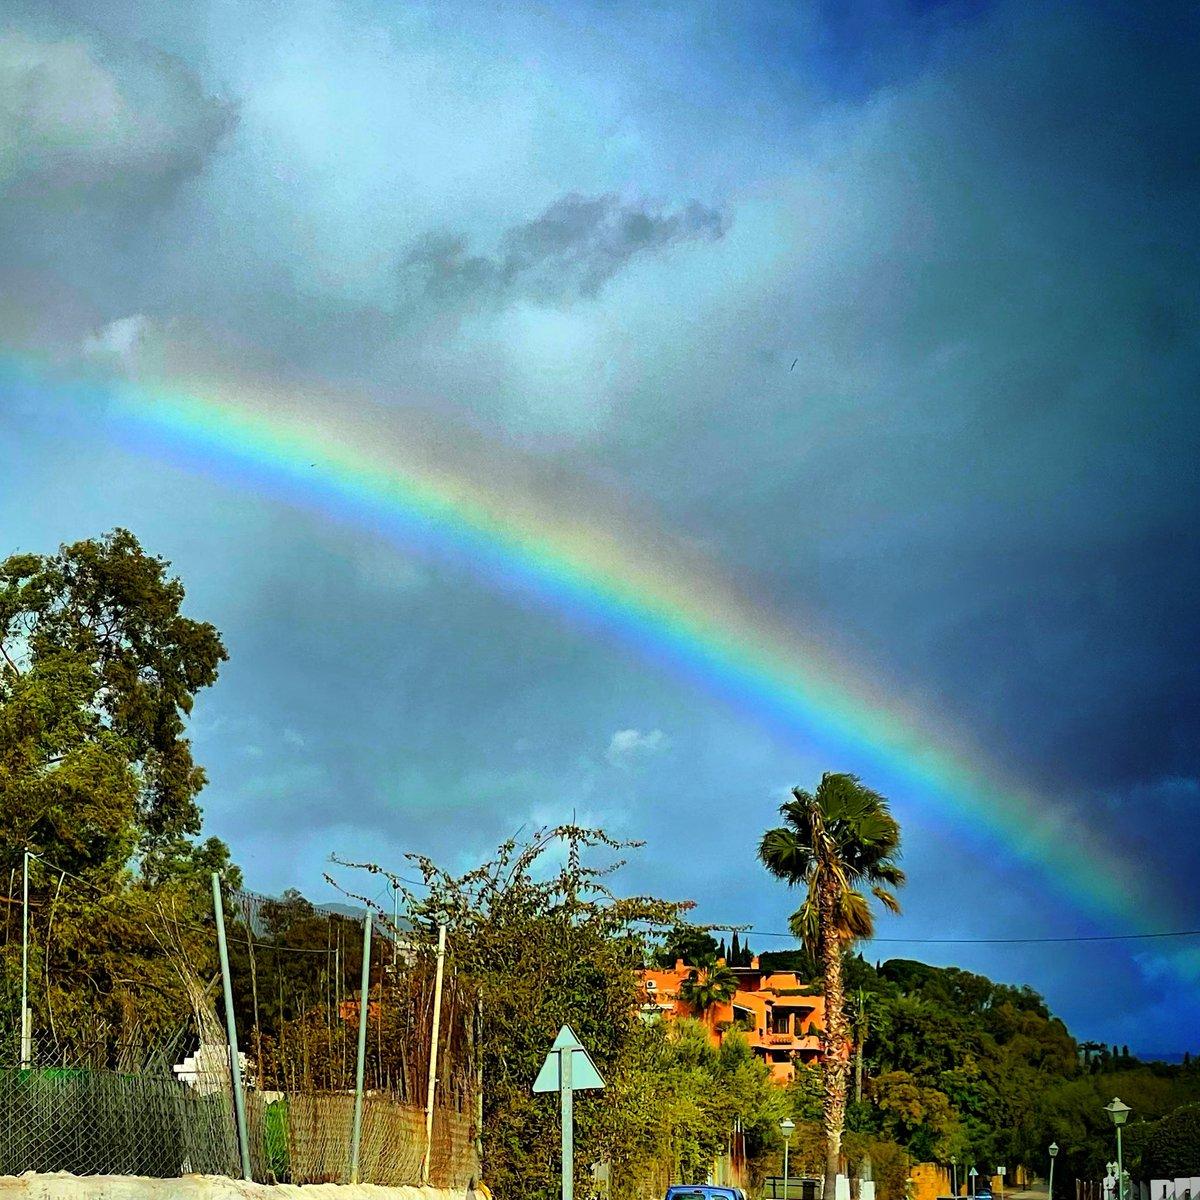 Somewhere over the rainbow #rainbow #monday #workday #sunrise #Lockdown #Curfew #VacunaCOVID19  #vaccination #Covid_19 #COVID19 #pixelart #coloursoftherainbow #thecolourpurple #Spain #Marketing #marbella #Dreamcatcher #GOLD #rain #magic #MakeAWish #Weather #greyskies #WearAMask